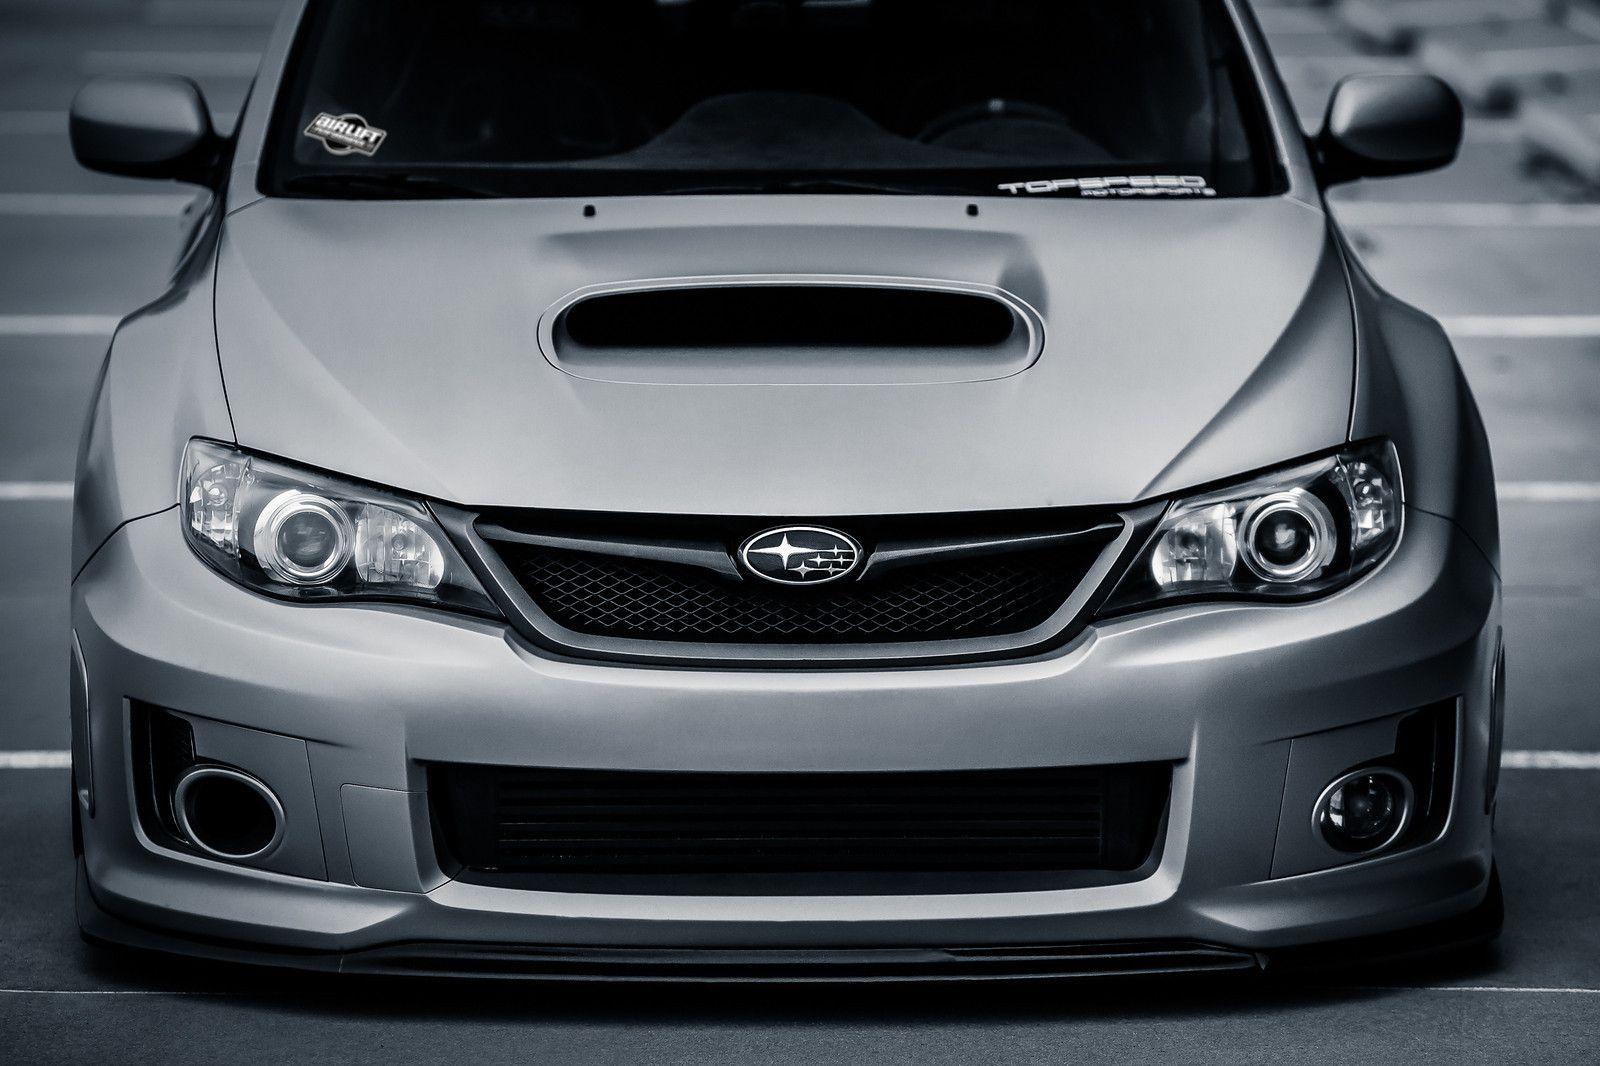 awesome Wrx, Subaru wrx hatchback